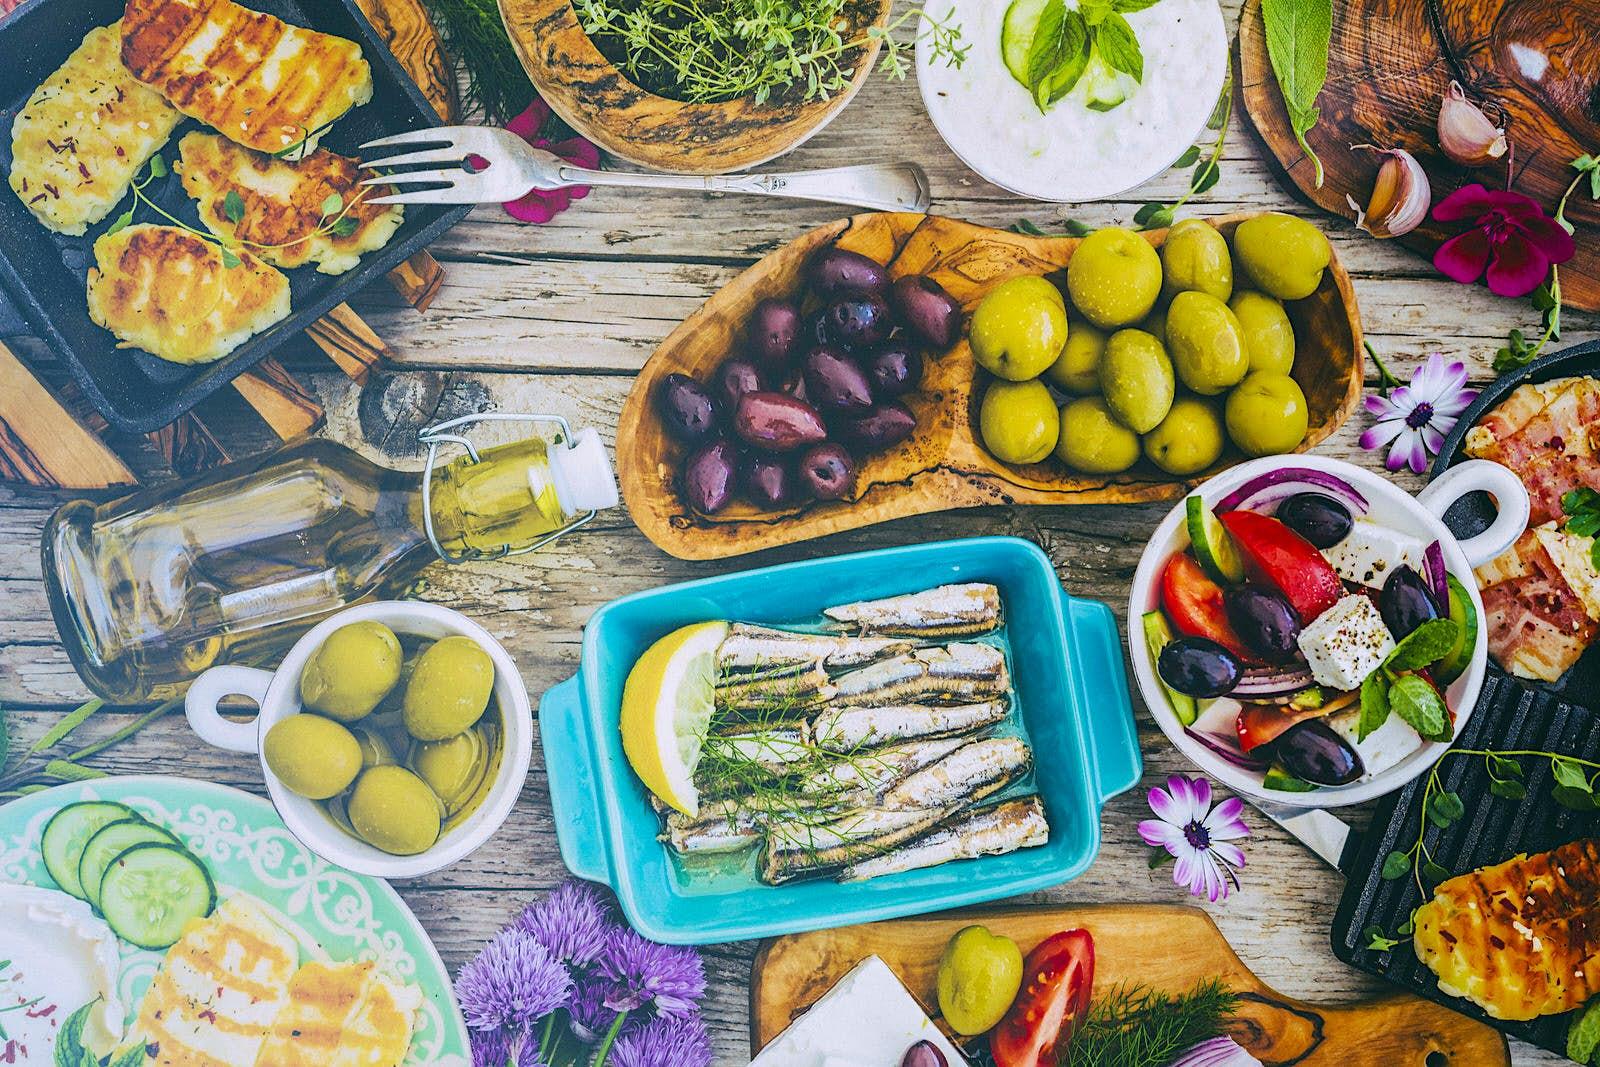 Greek cuisine with mandatory olives © gorillaimages / Shutterstock